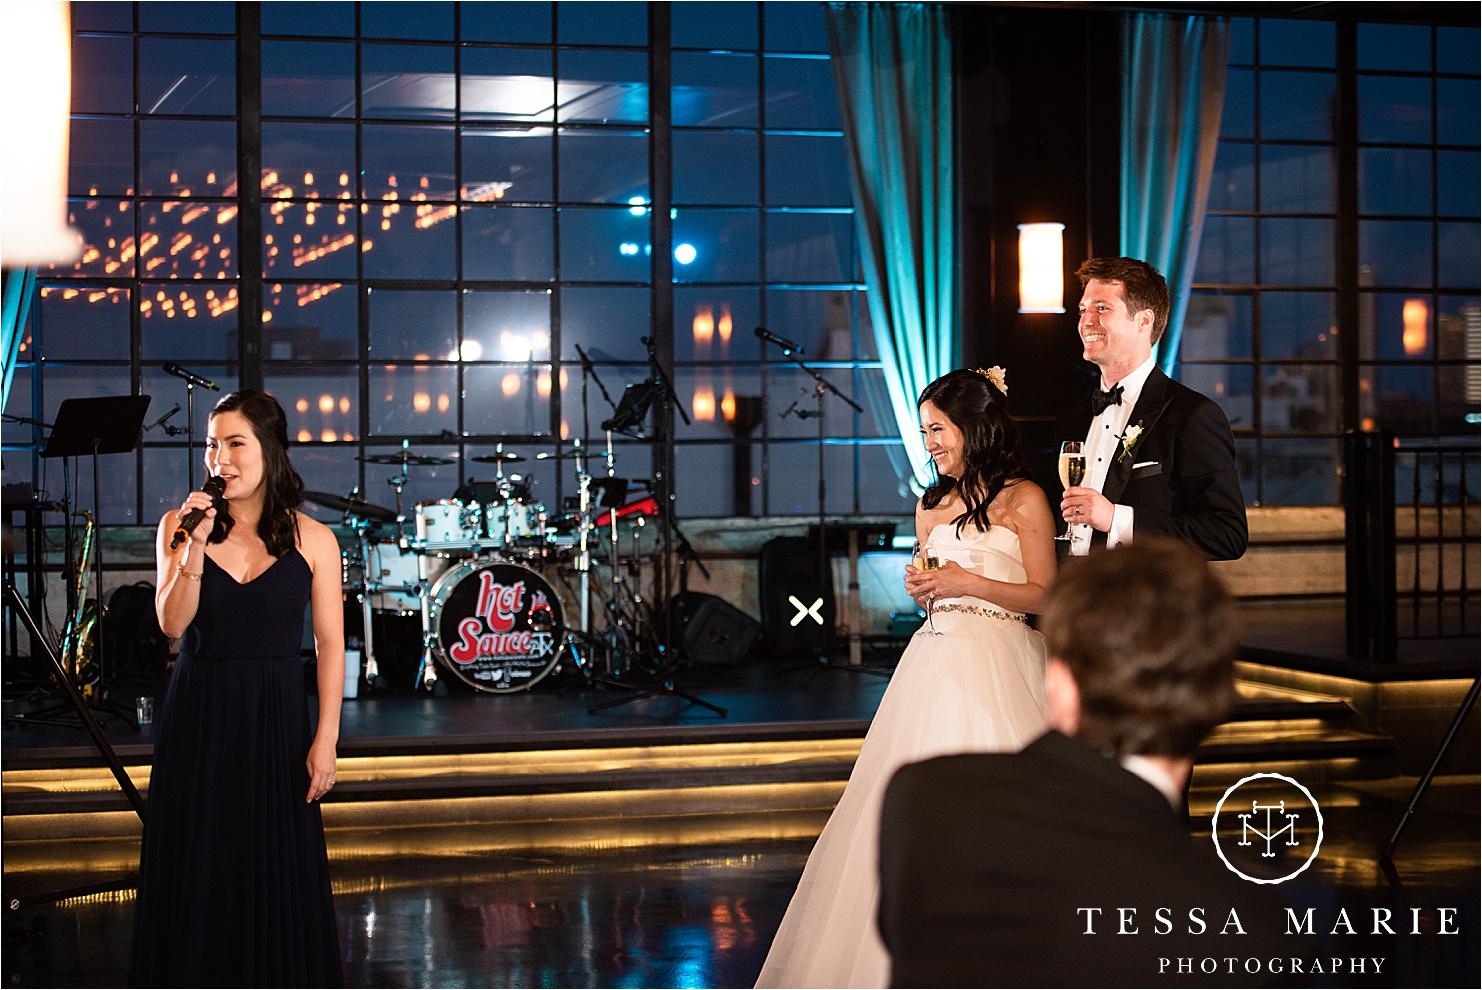 Tessa_marie_weddings_houston_wedding_photographer_The_astorian_0154.jpg